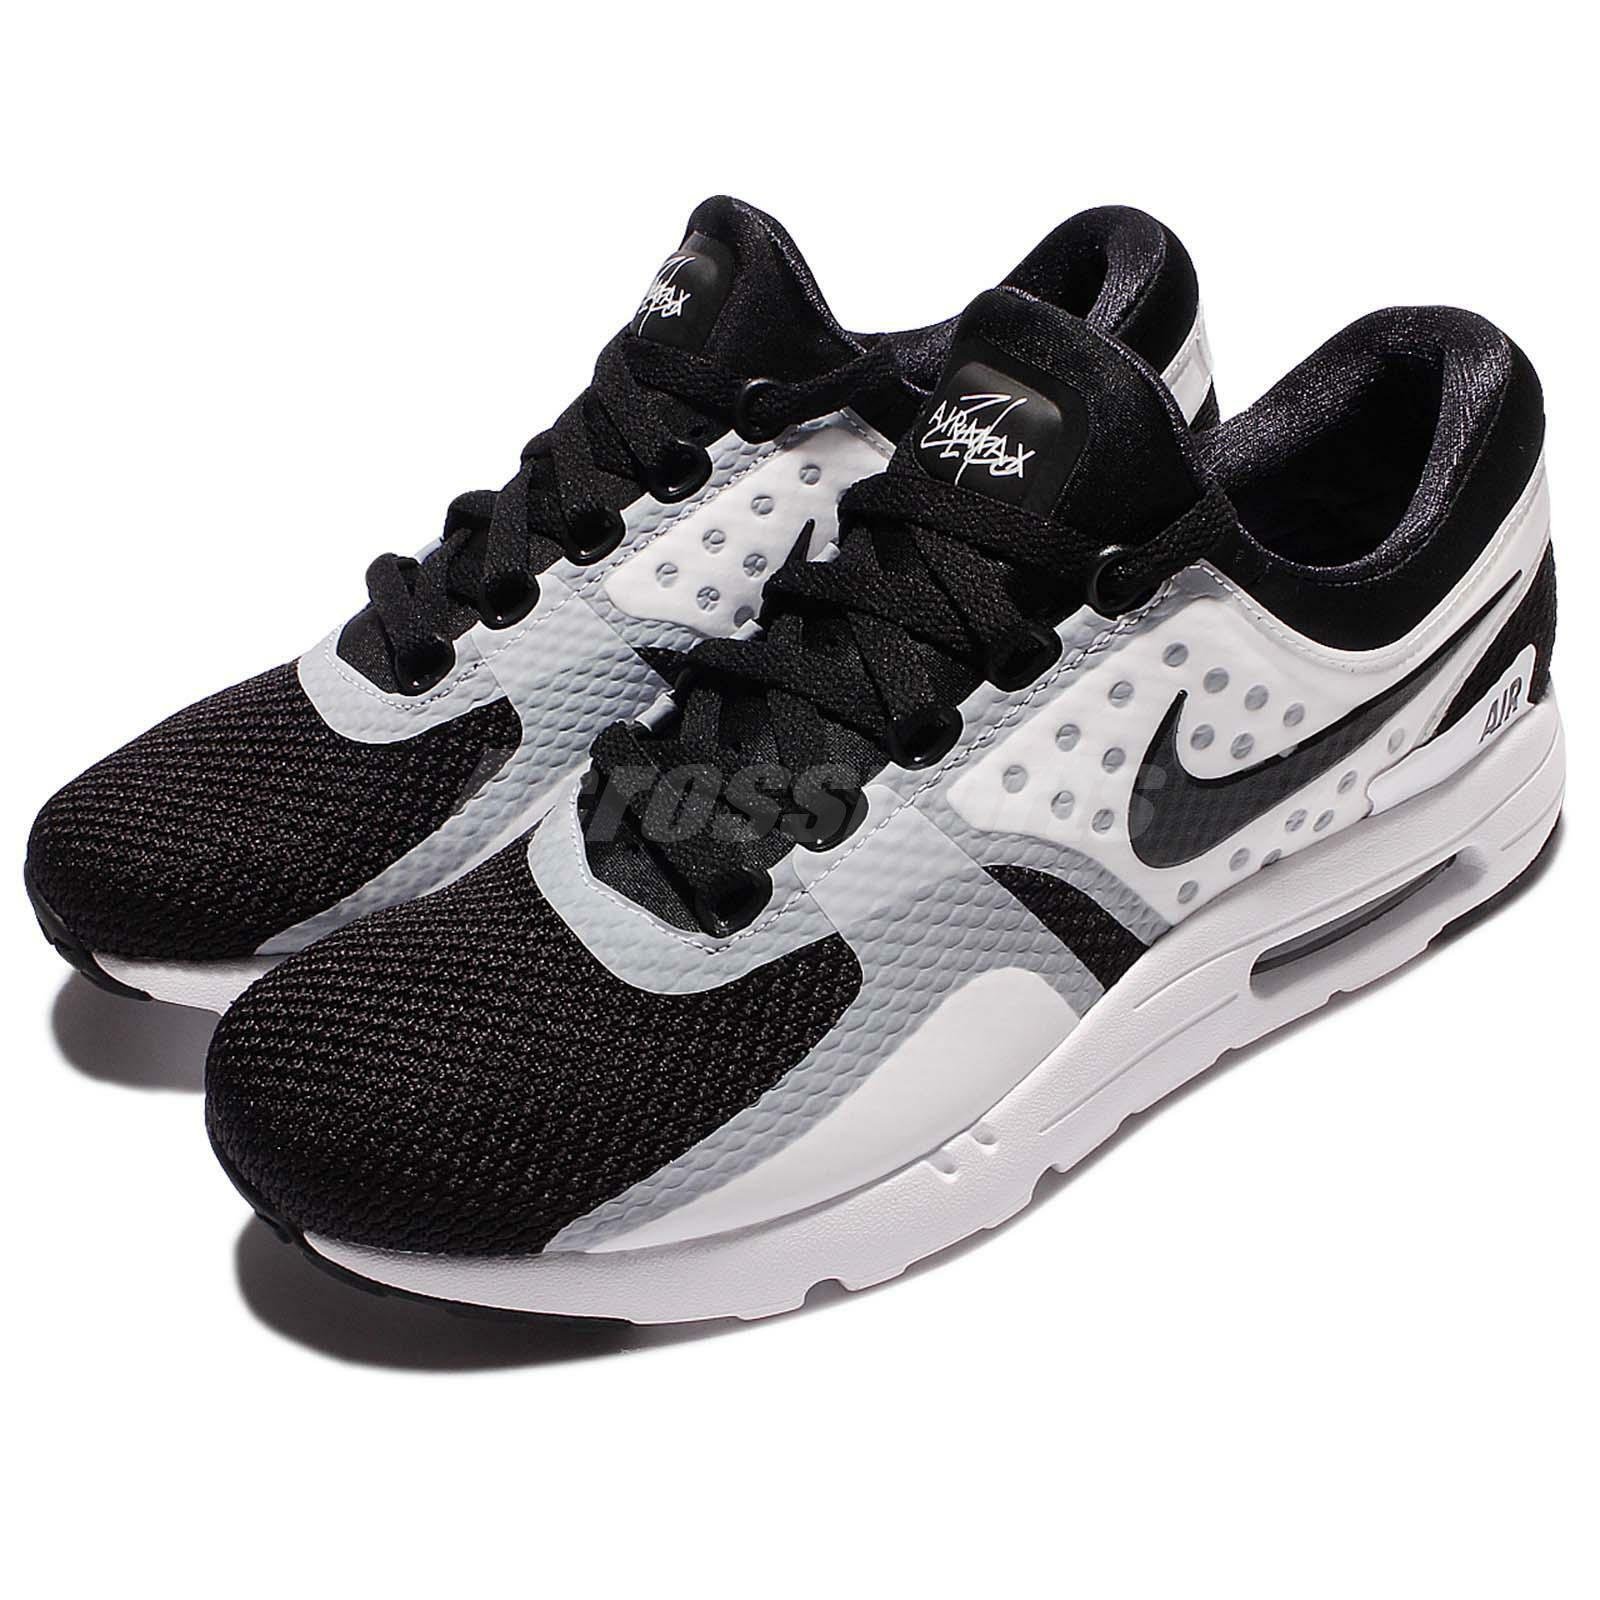 Nike air max zero nero gli uomini bianchi, scarpe da ginnastica essenziale 876070-101